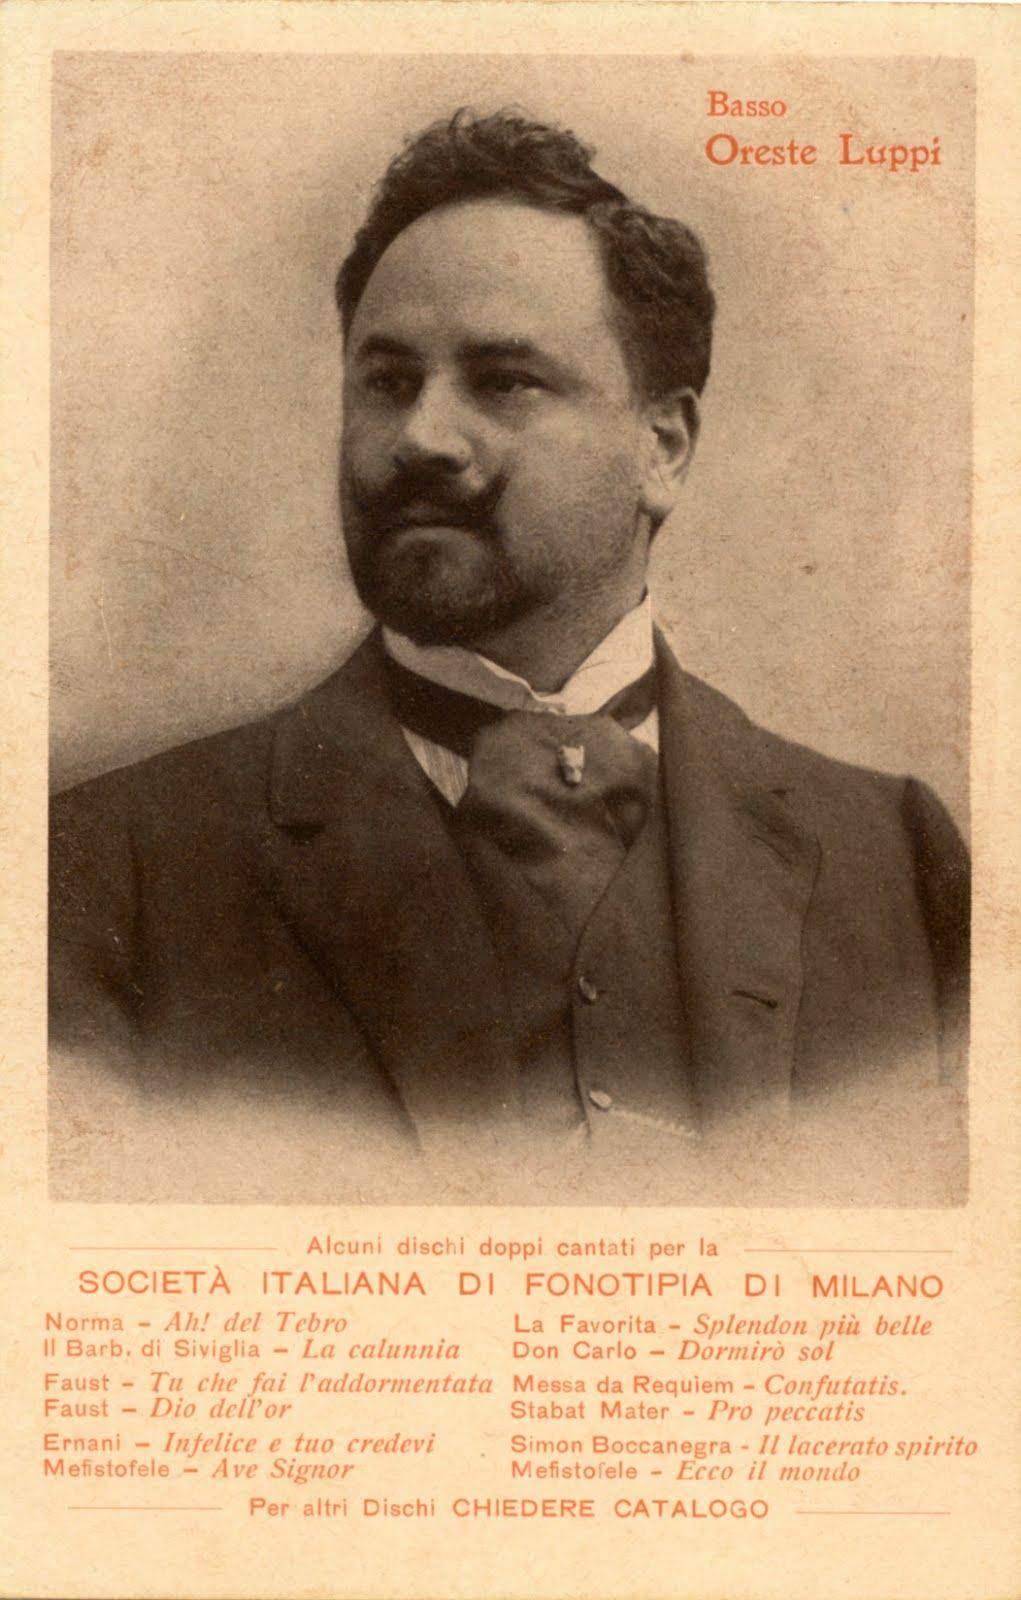 ITALIAN BASS ORESTE LUPPI (1870-1962) CD